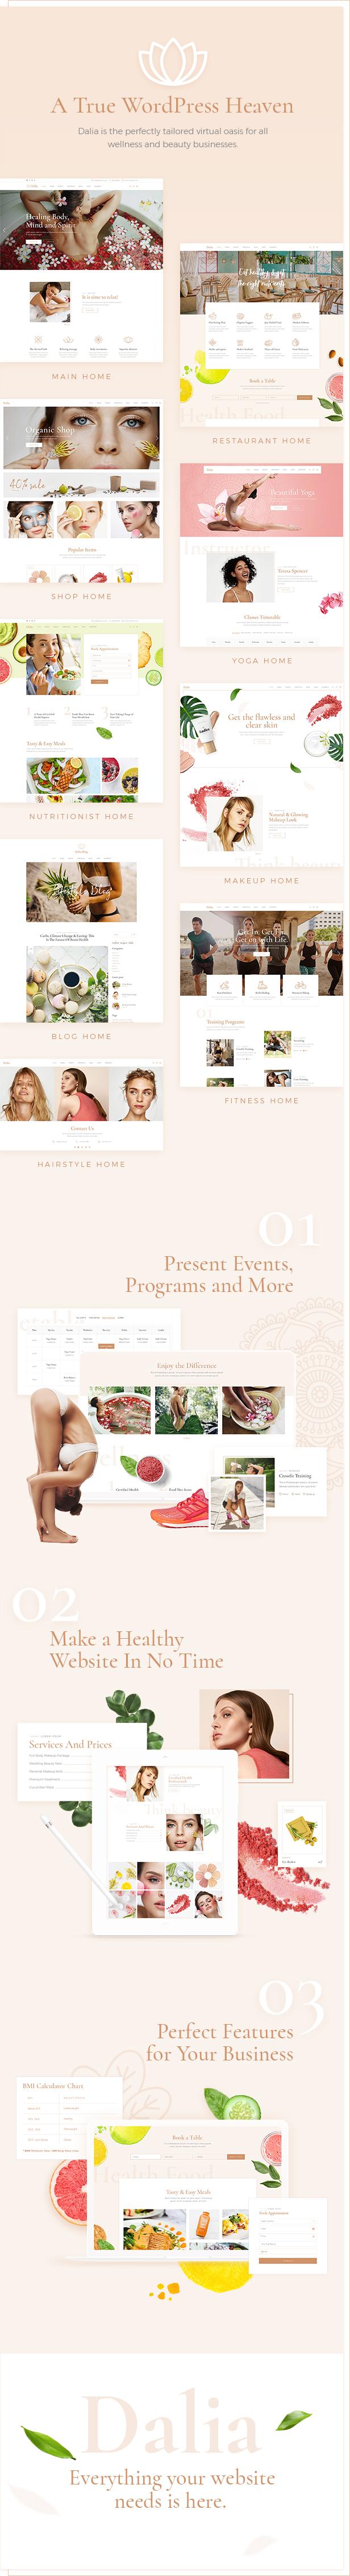 Dalia - A Modern Wellness and Lifestyle Theme - 1